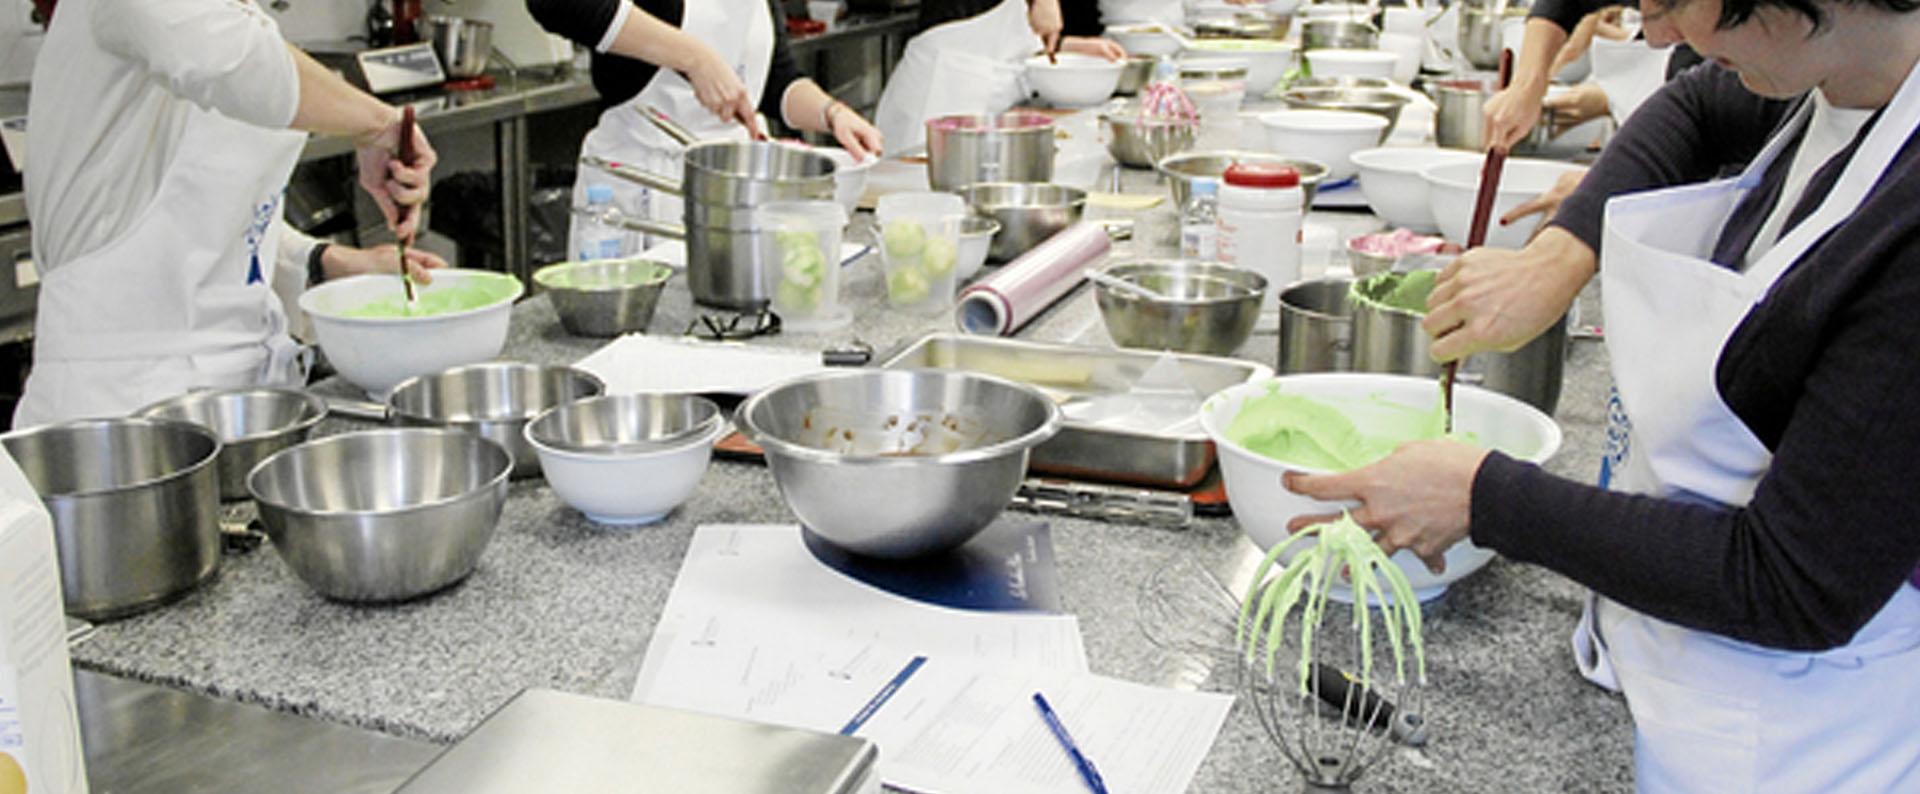 Cursos De Cocina | Cursos Privados De Cocina Escuela De Cocina Amanca